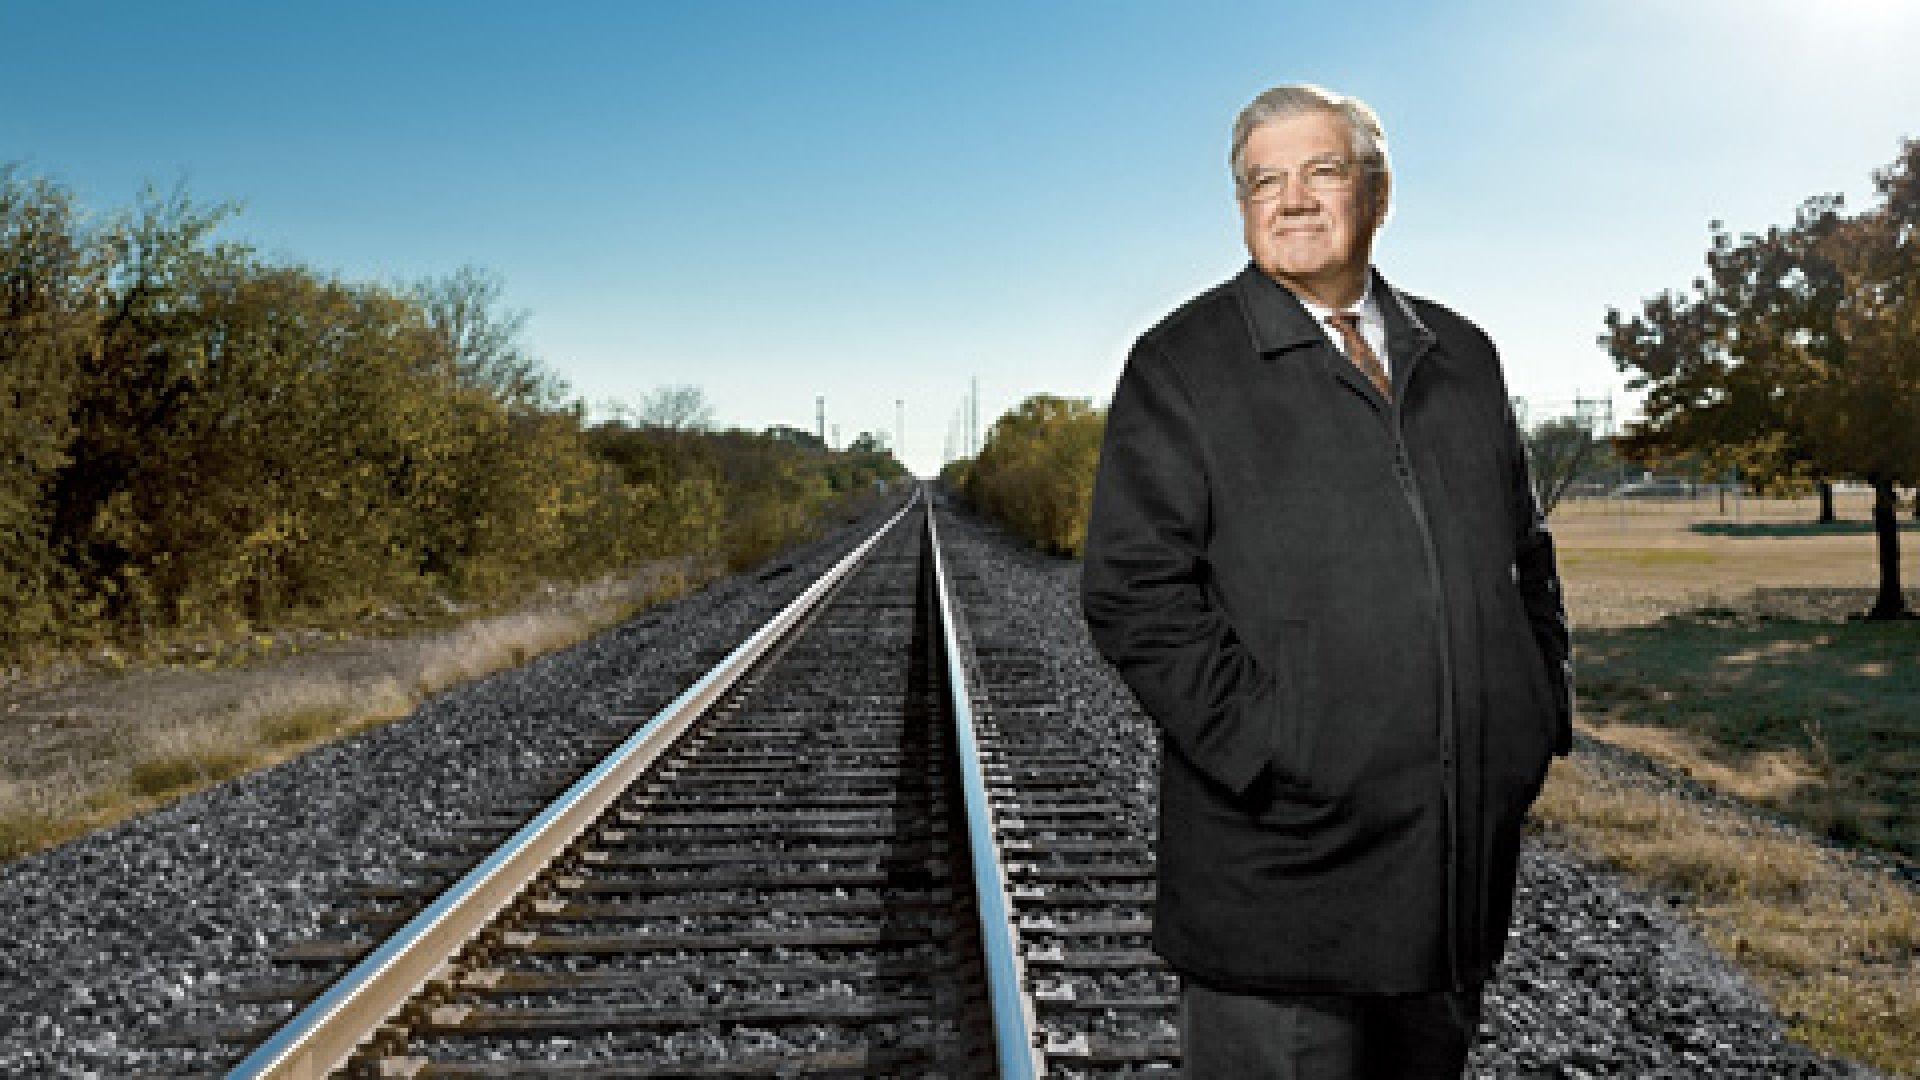 Bruce Flohr, founder of RailTex